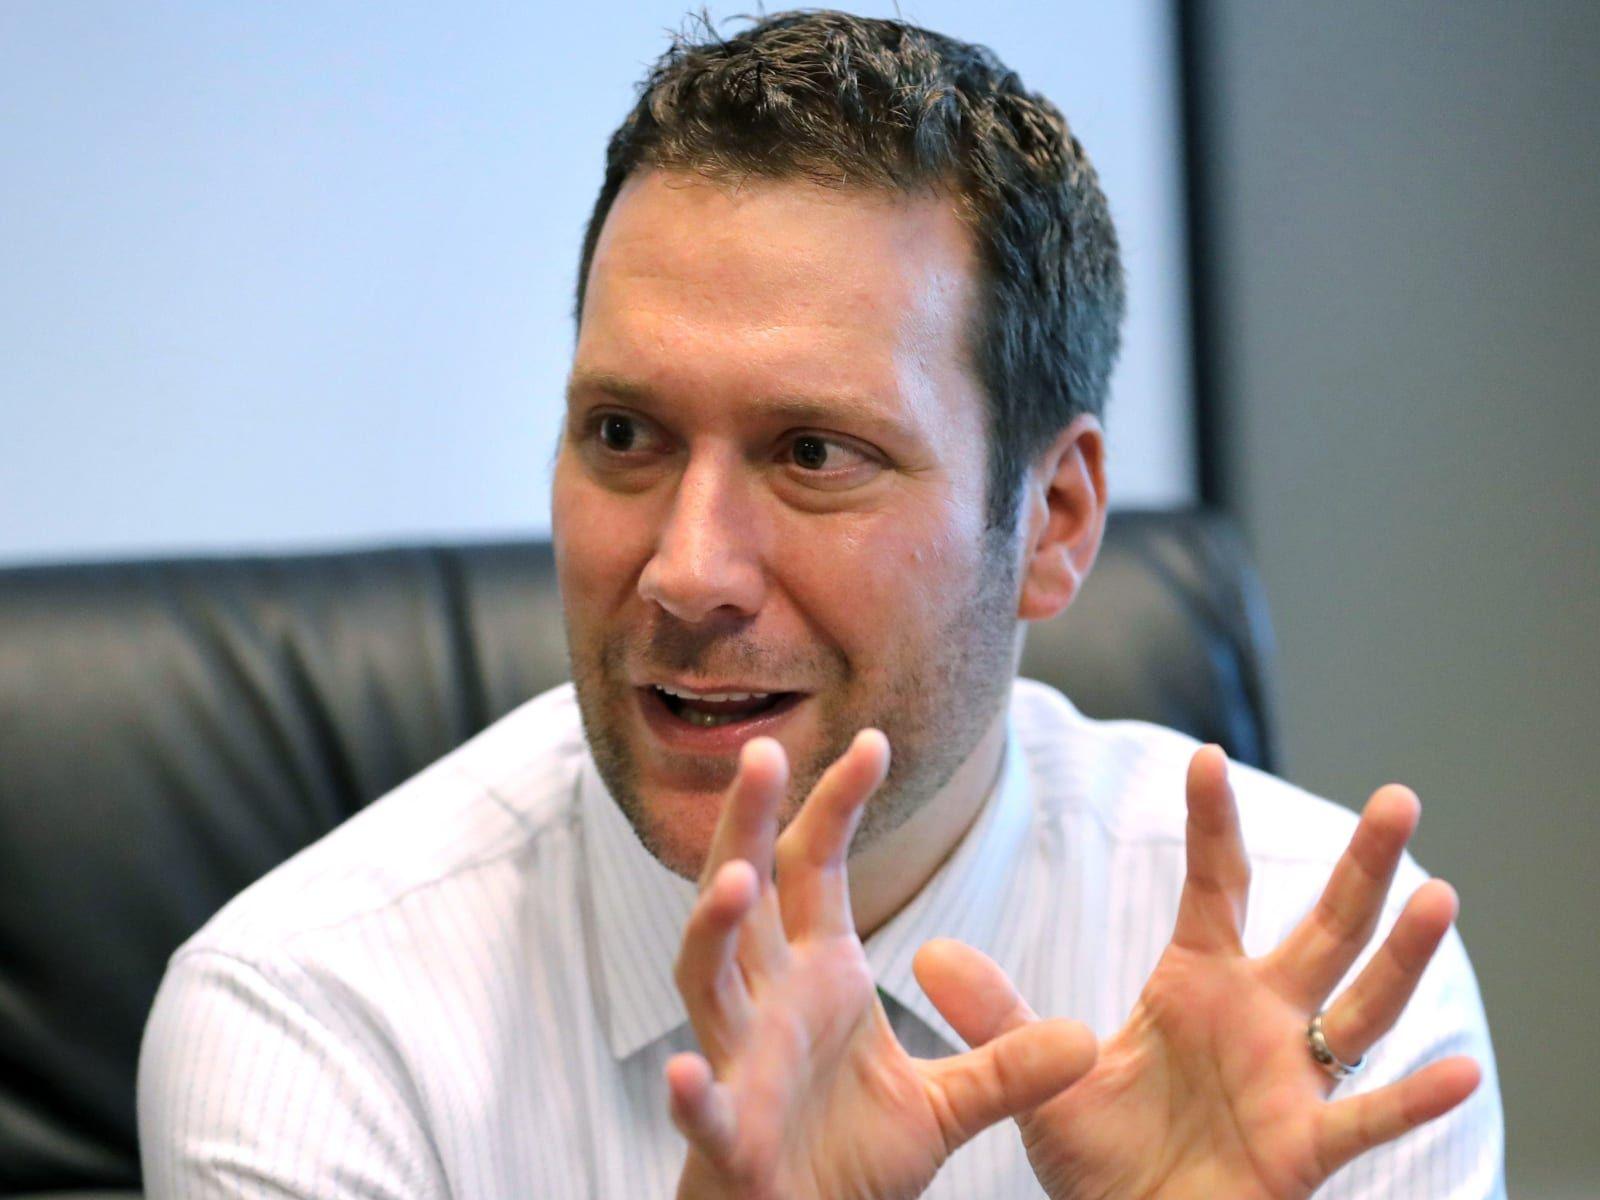 Matt Gaetz wingman Greenberg raked in $400k in COVID relief cash through bribery: feds